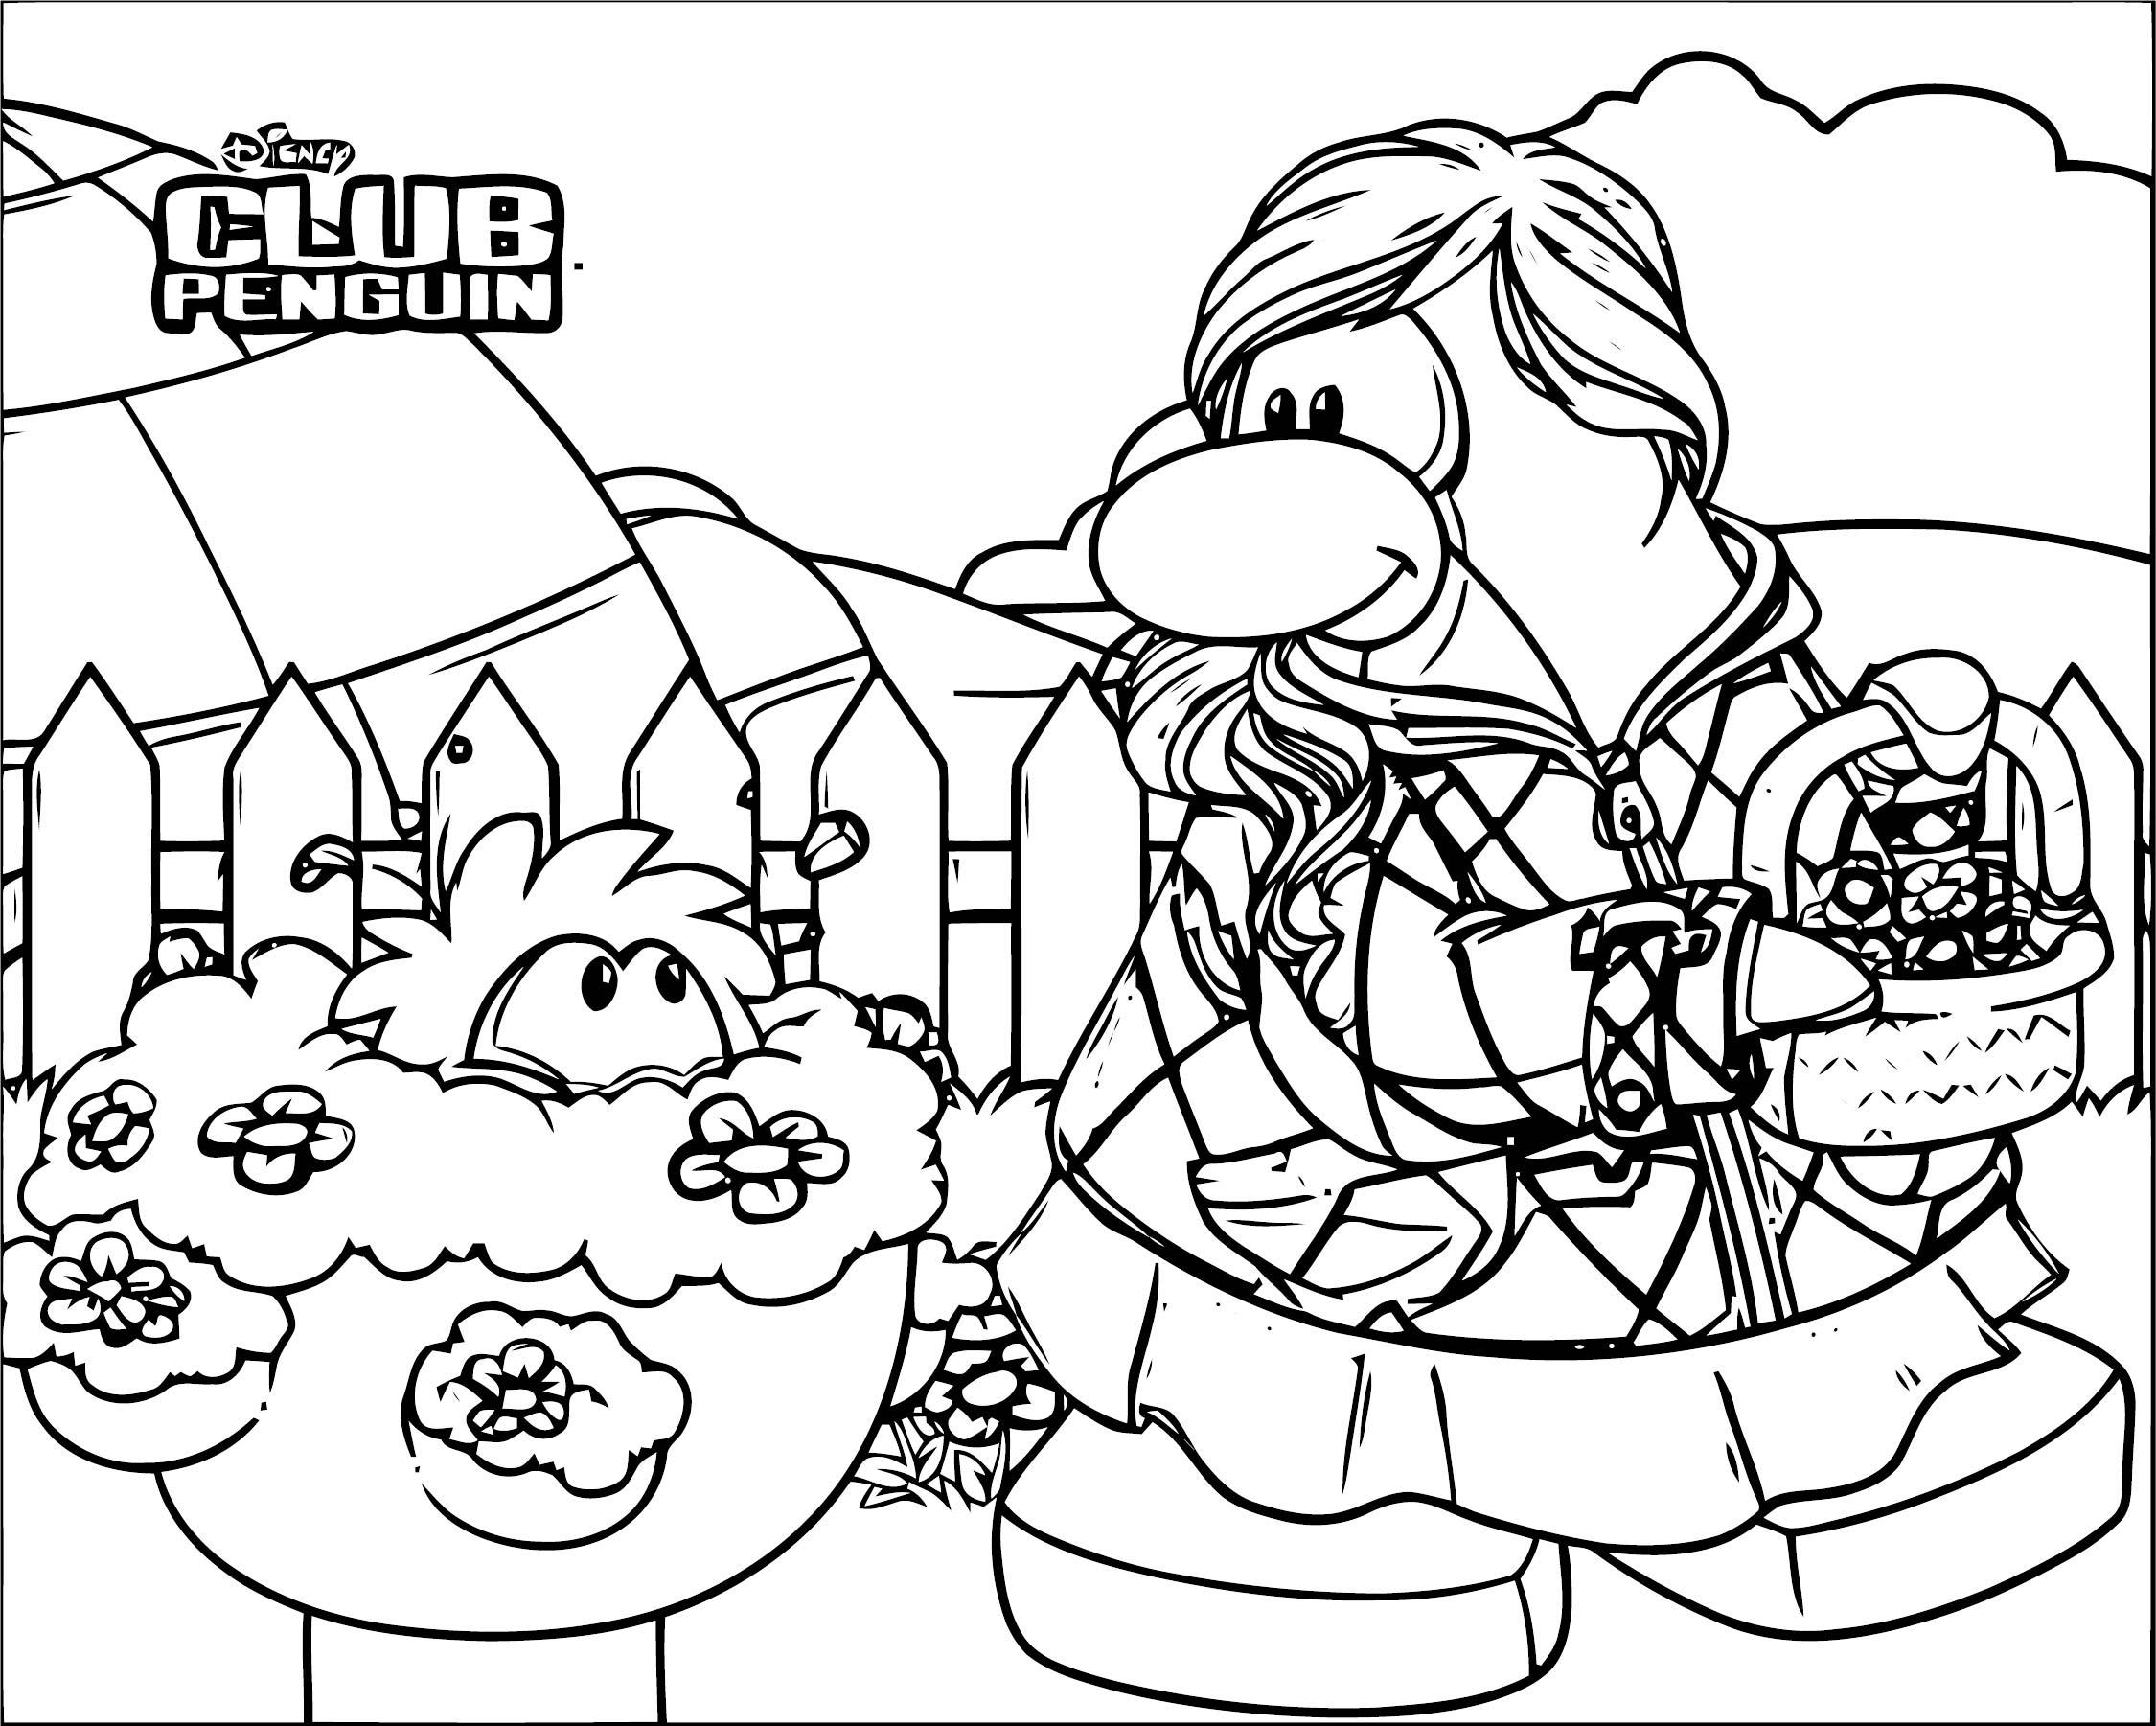 club penguin coloring pages of rockhopper exploration | Club Penguin Coloringpage Spring | Wecoloringpage.com